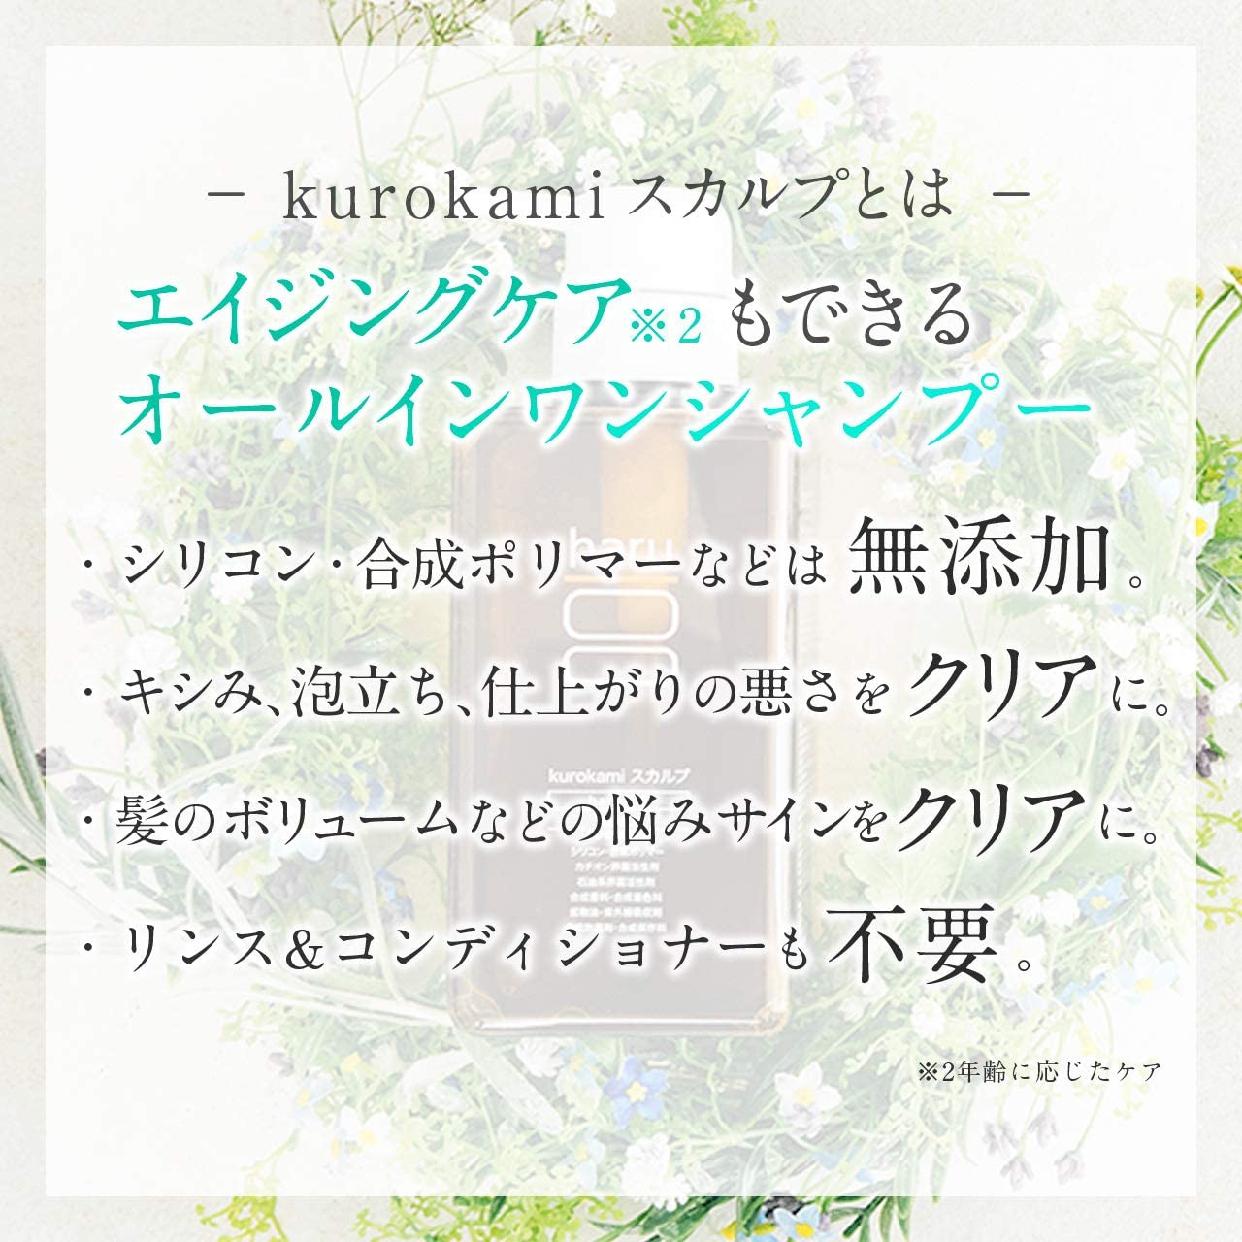 haru(ハル)kurokami スカルプの商品画像14